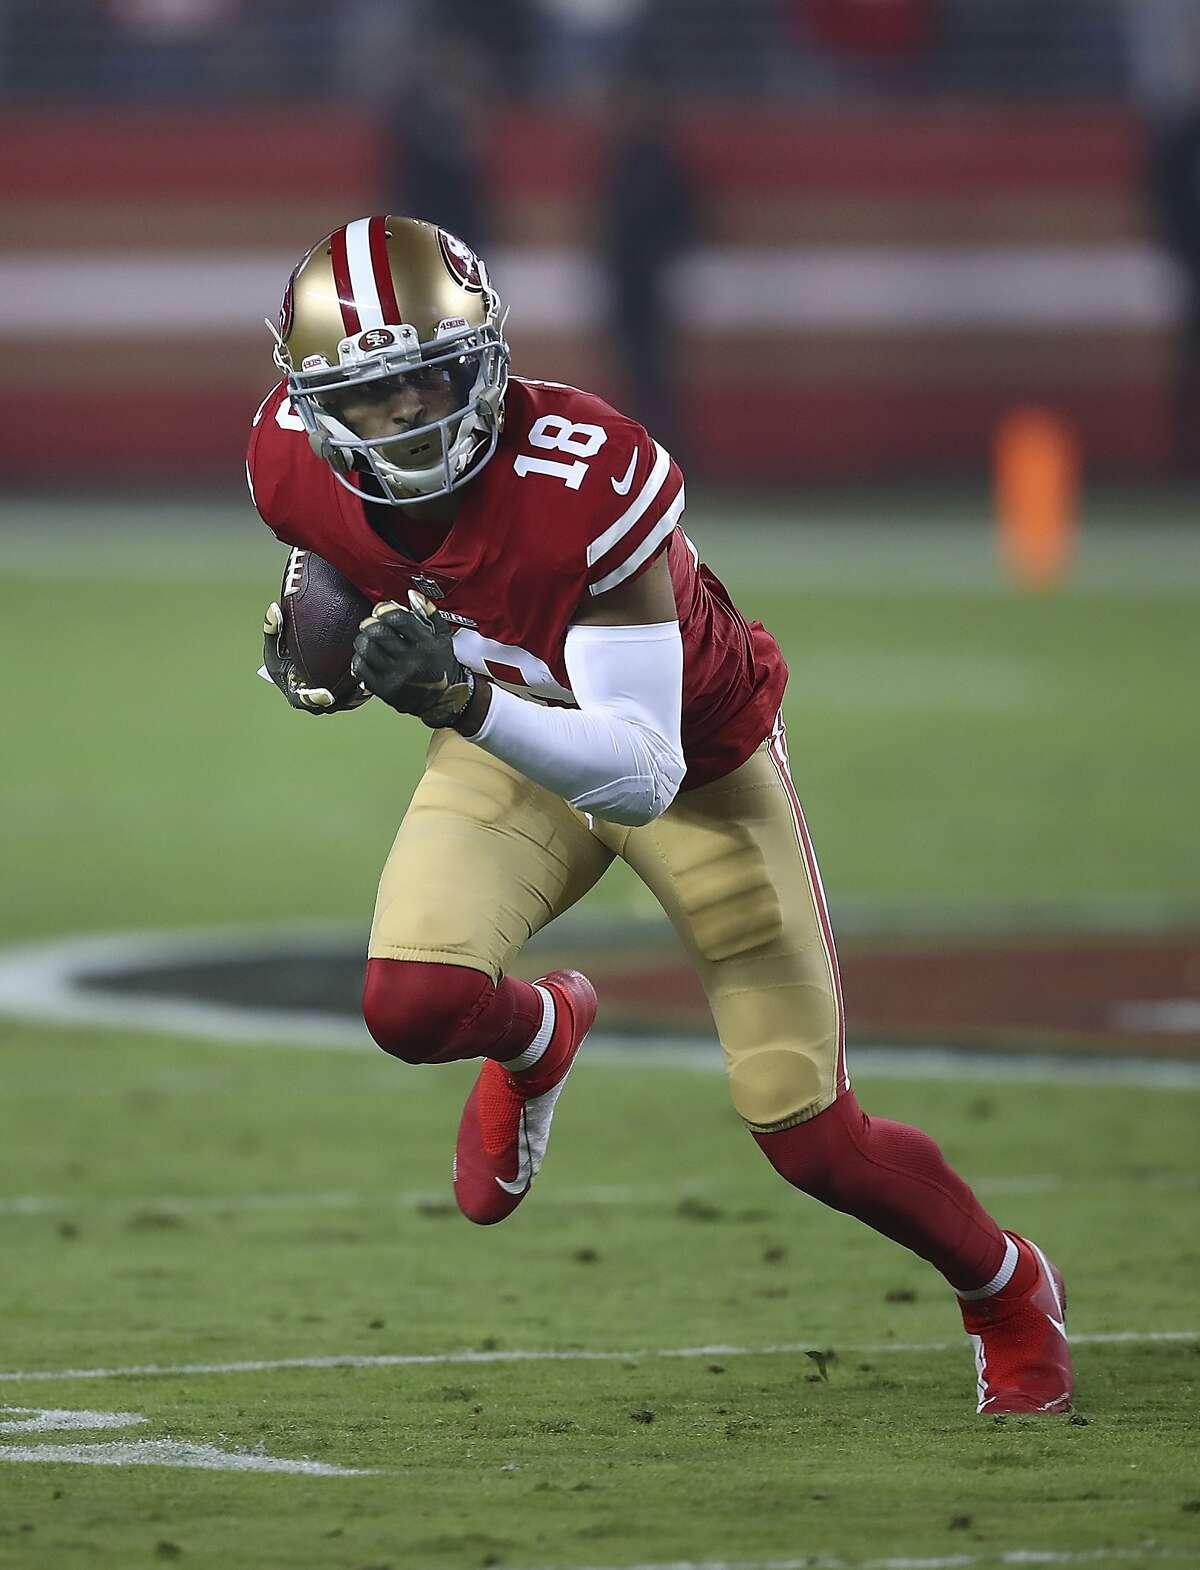 San Francisco 49ers wide receiver Dante Pettis (18) against the New York Giants during an NFL football game in Santa Clara, Calif., Monday, Nov. 12, 2018. (AP Photo/Ben Margot)